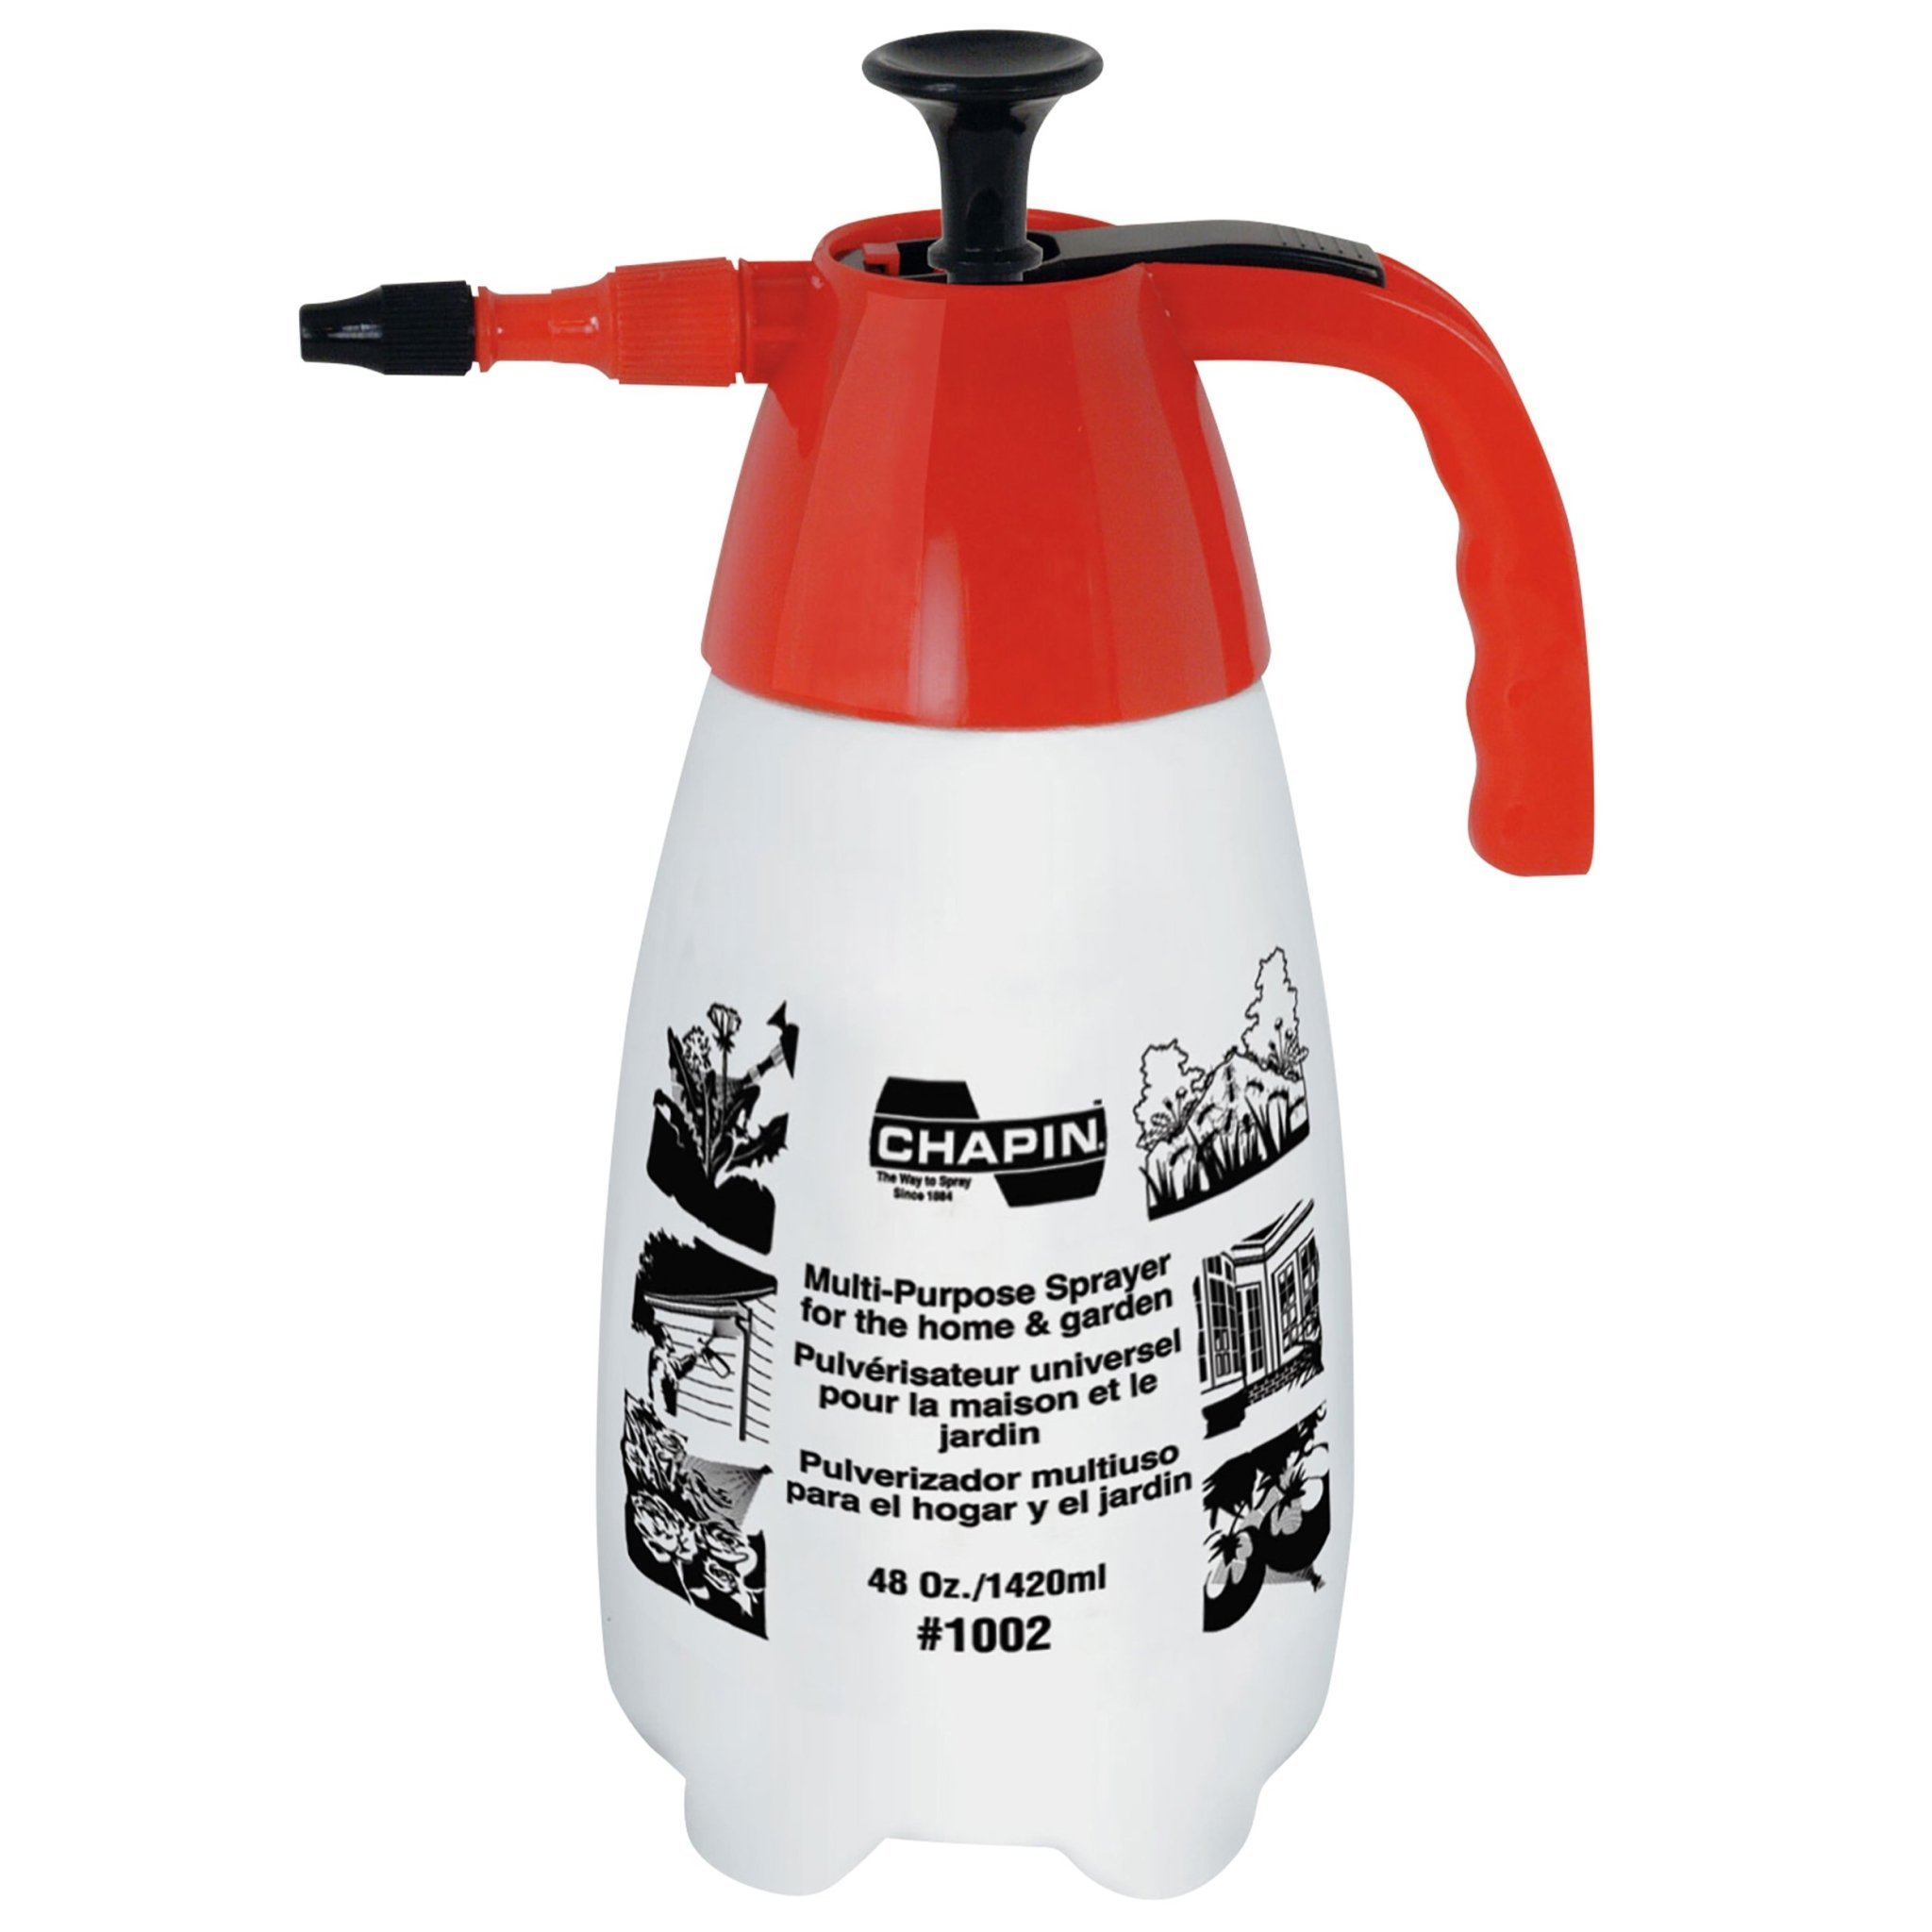 Chapin 1002 – 1.4ltr Multi-Purpose Nitrile Hand Sprayer